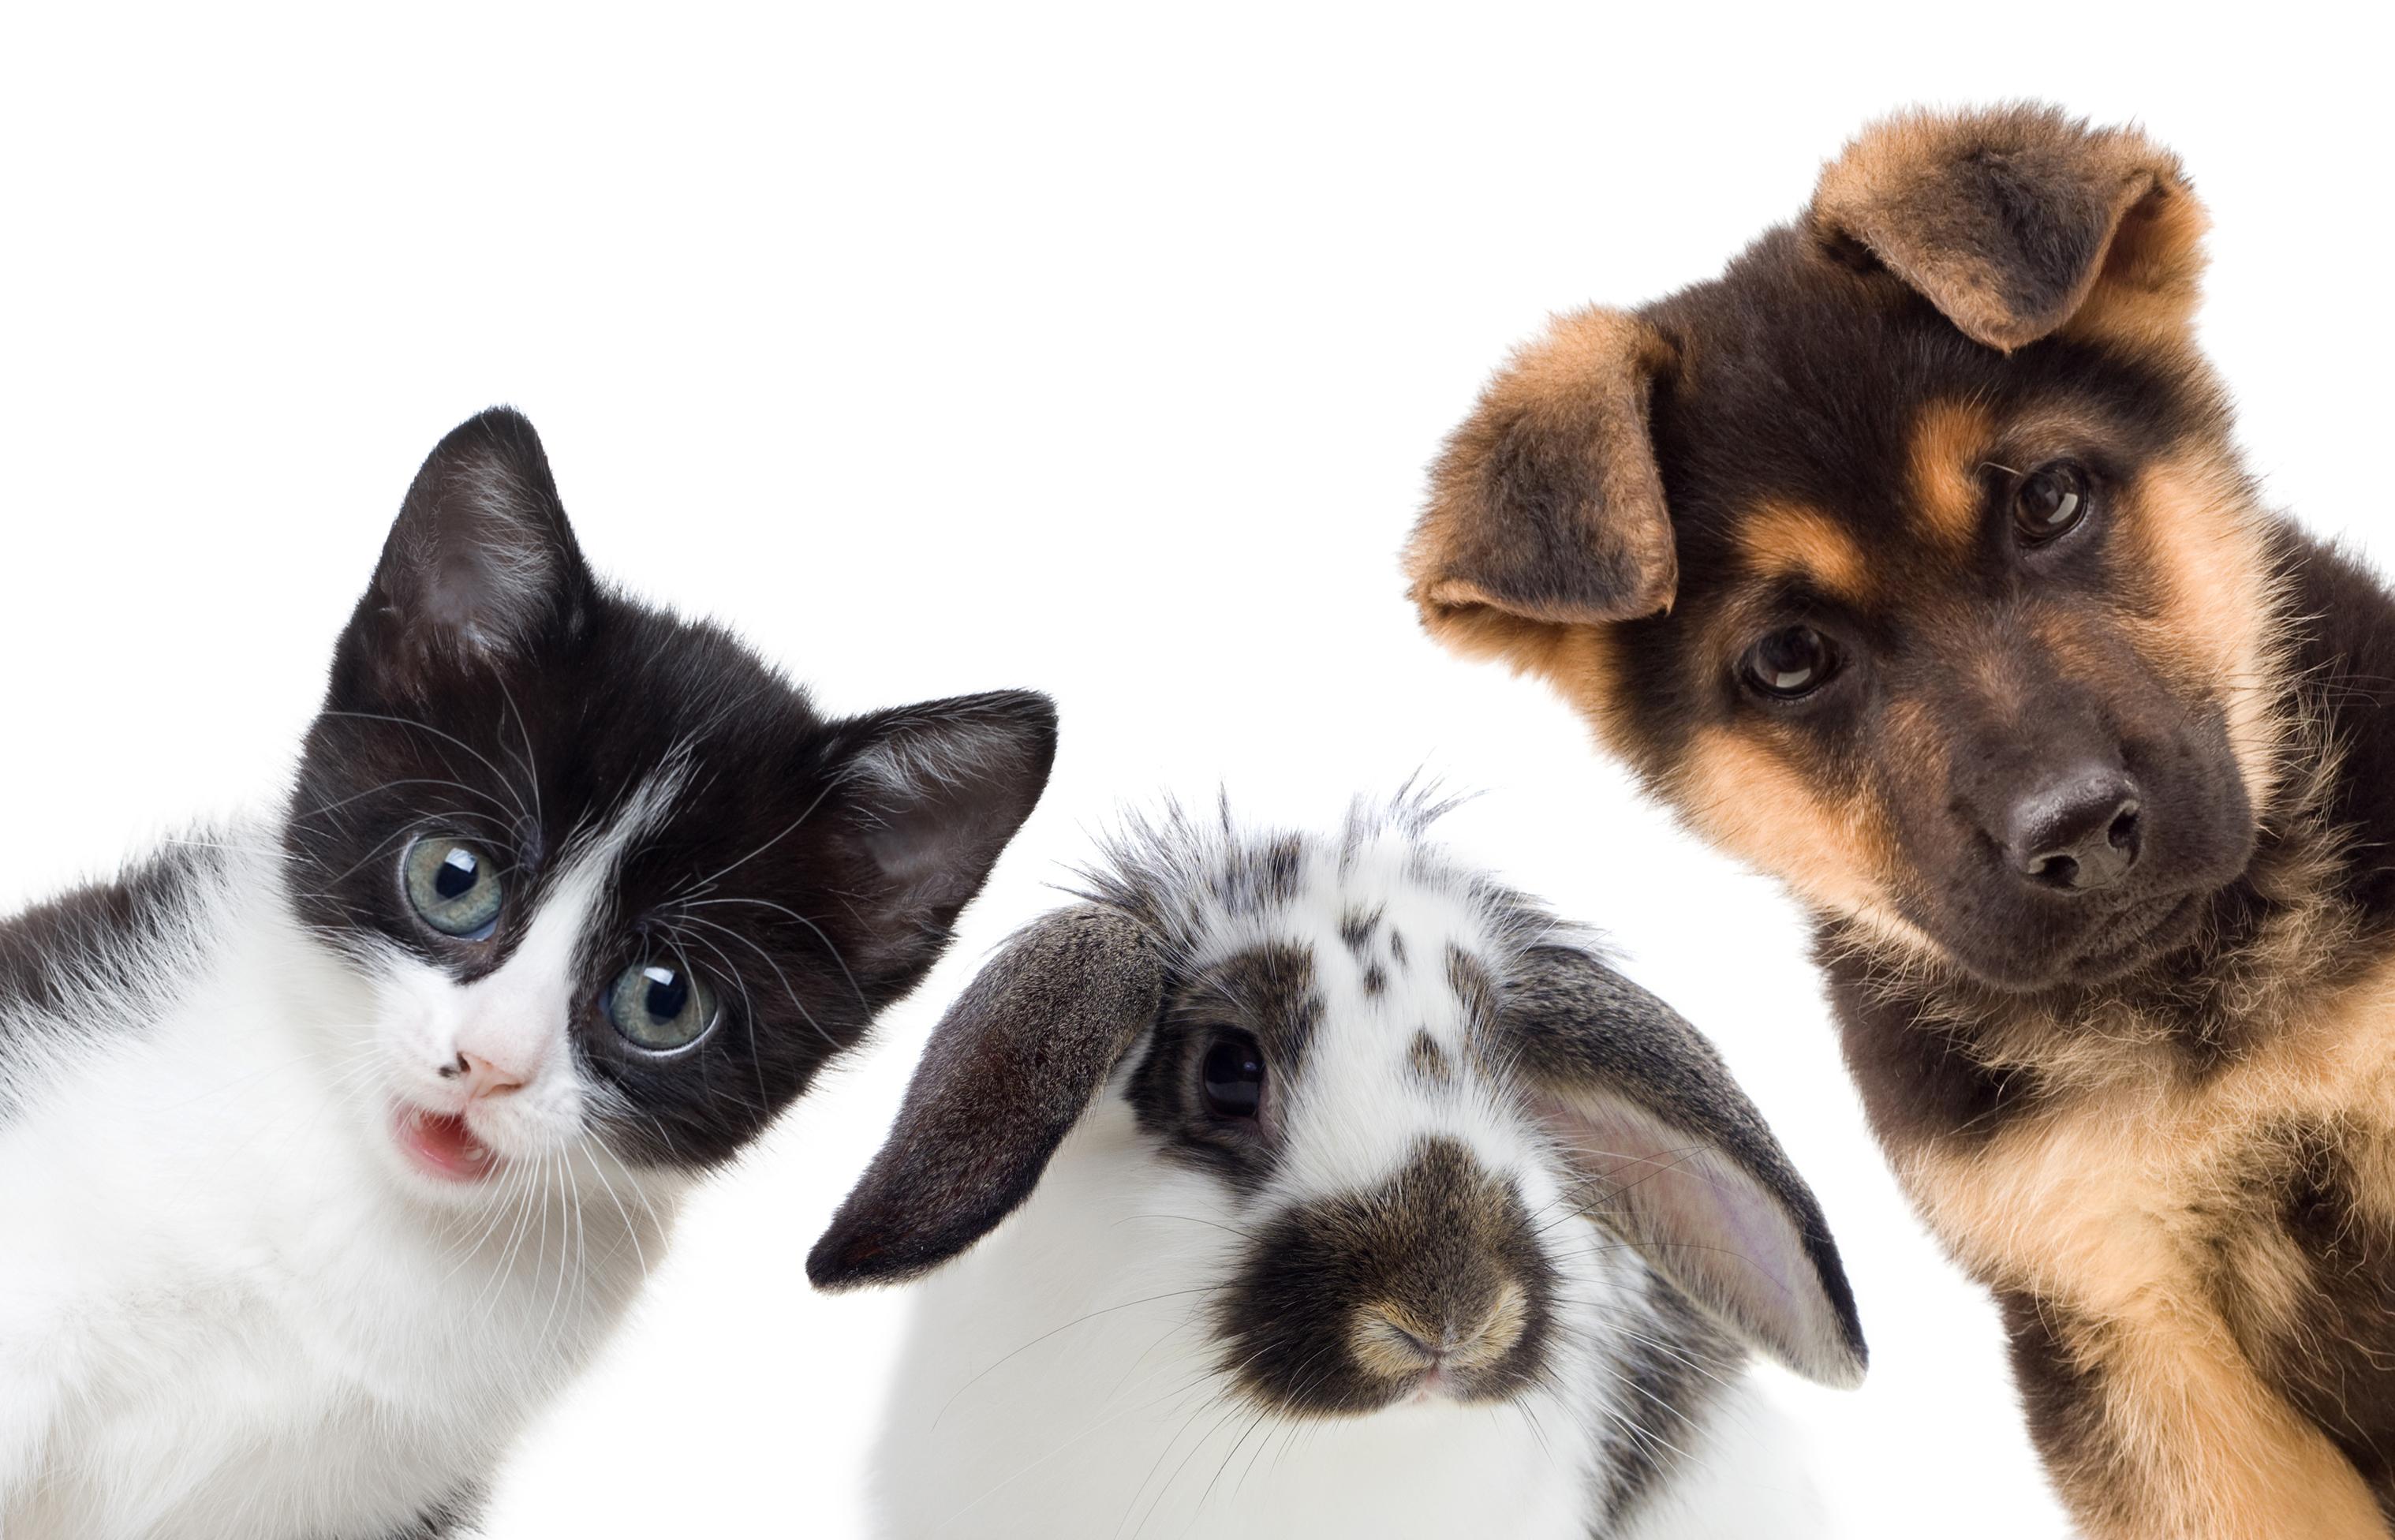 Dog, cat, and rabbit